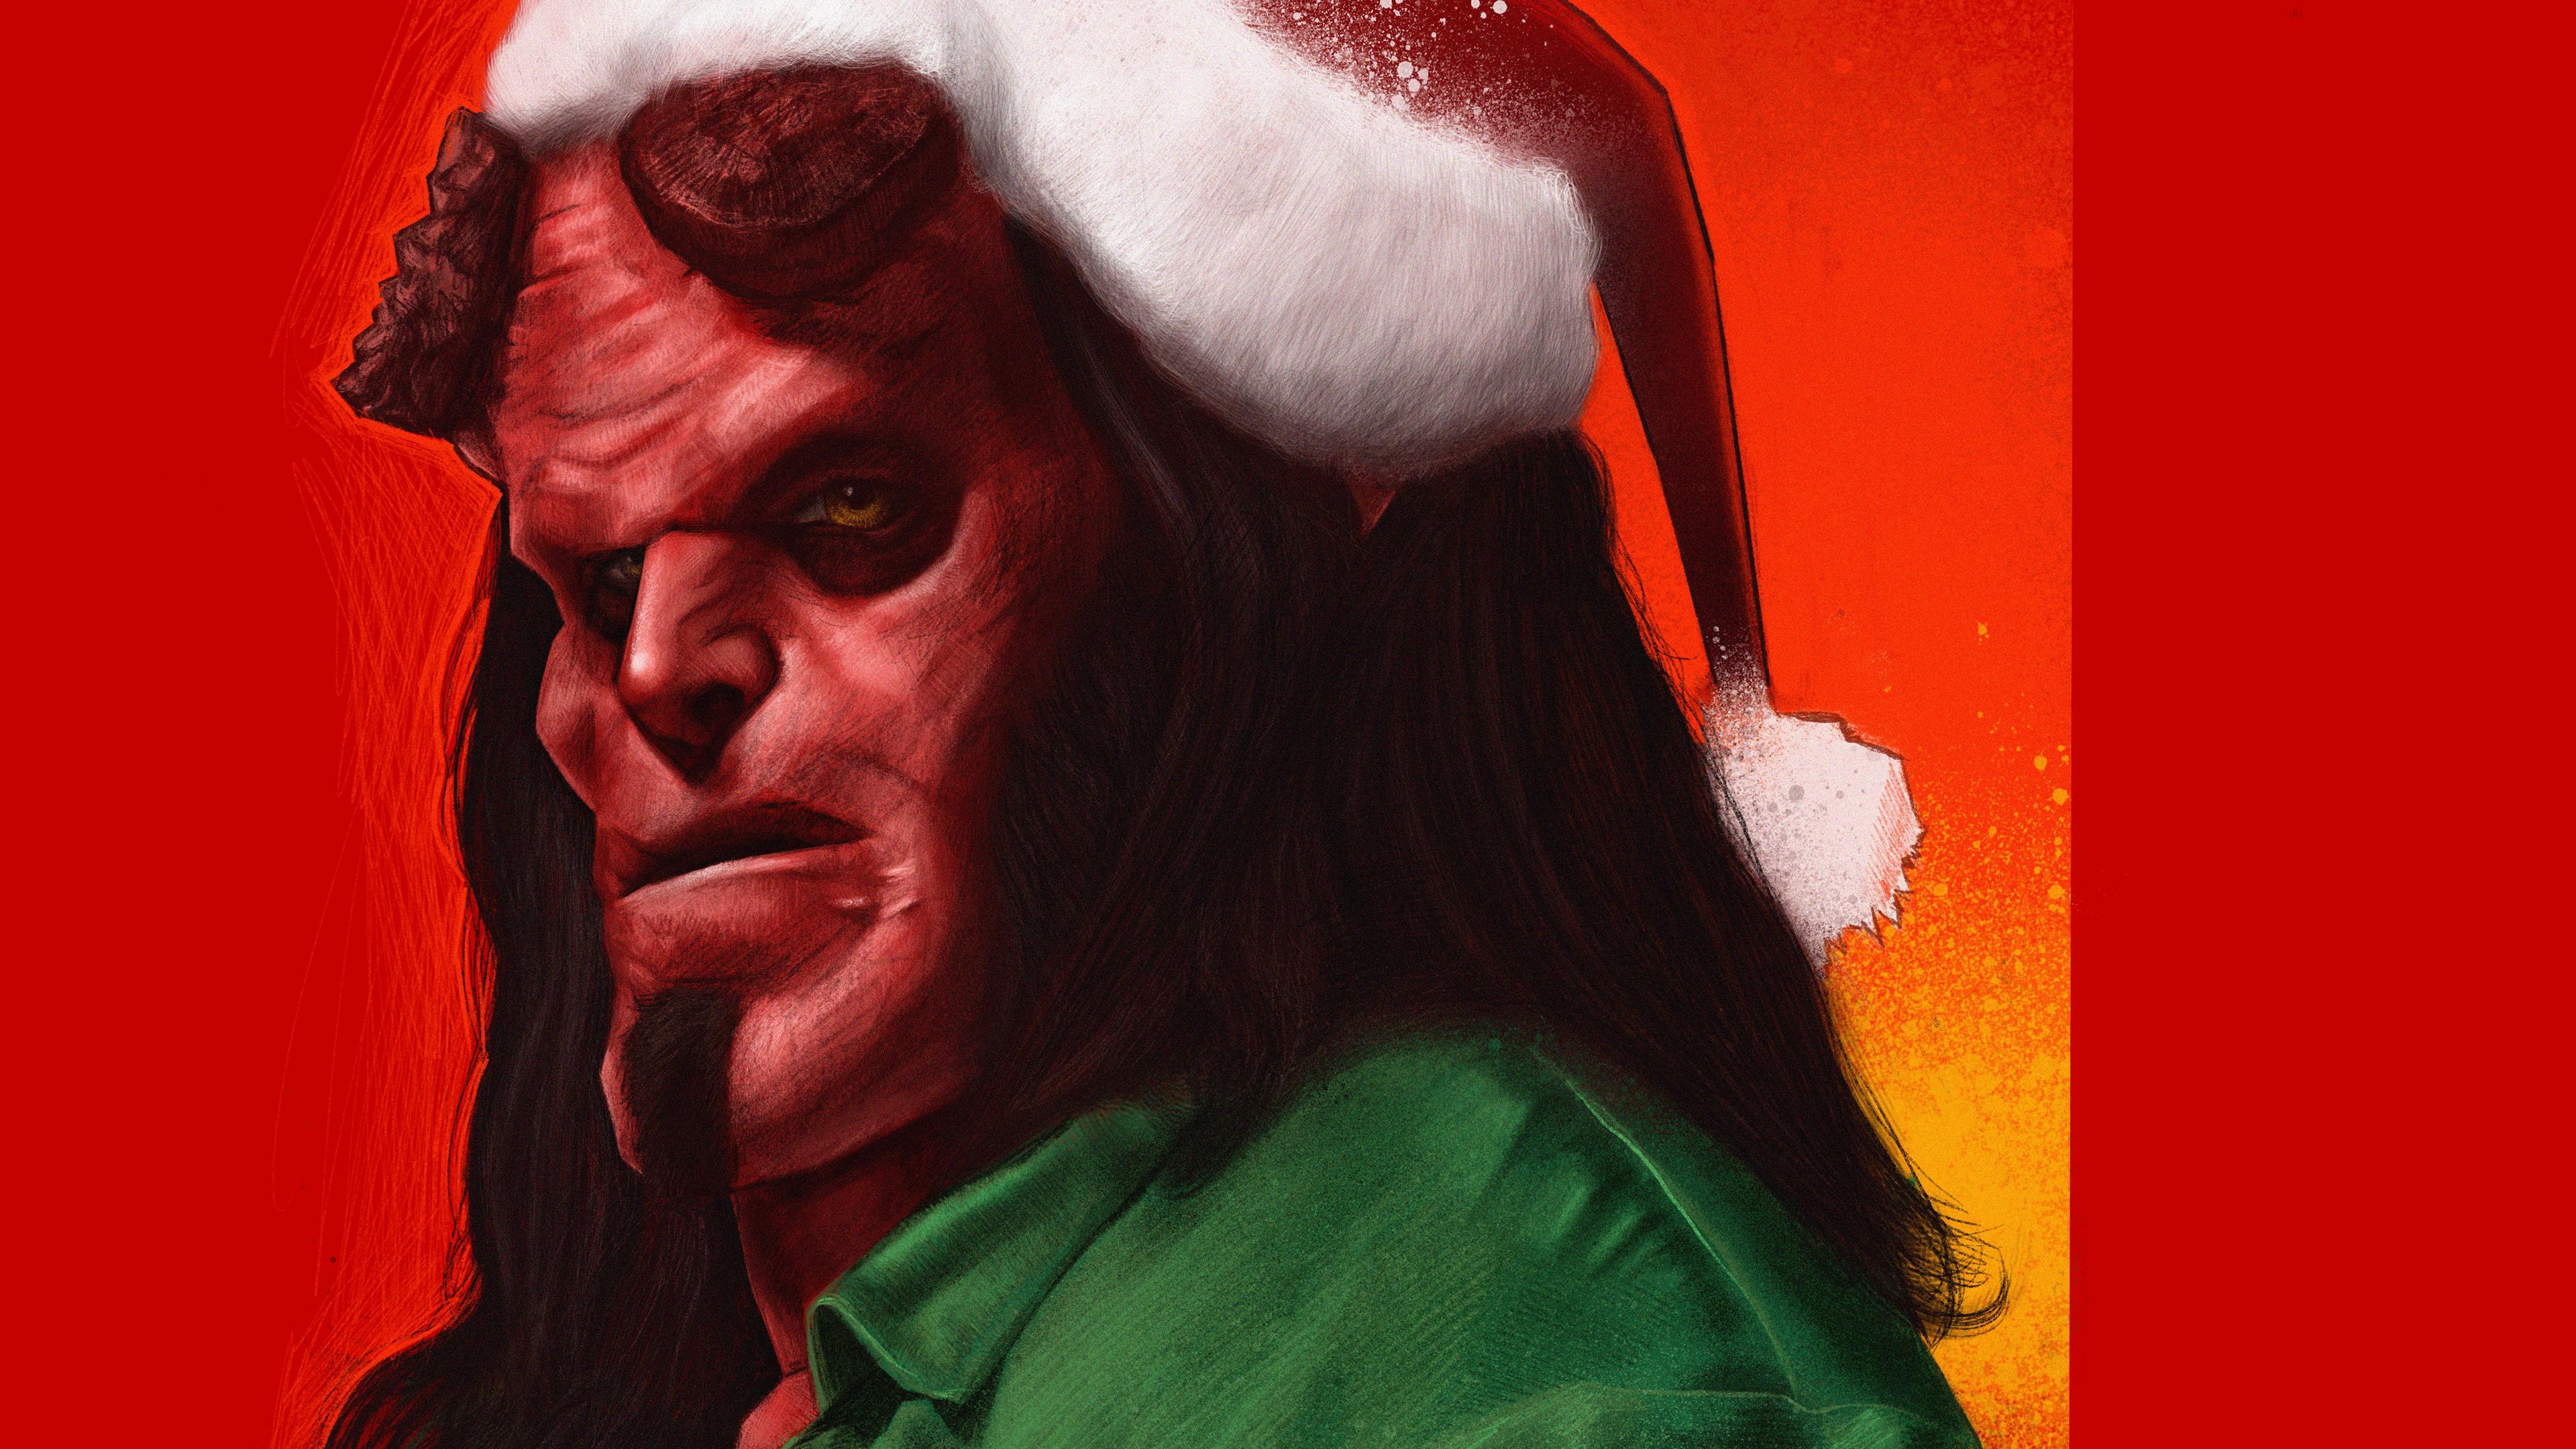 hell of a christmas 1559764230 - Hell Of A Christmas - superheroes wallpapers, hellboy wallpapers, hd-wallpapers, digital art wallpapers, behance wallpapers, artwork wallpapers, art wallpapers, 4k-wallpapers